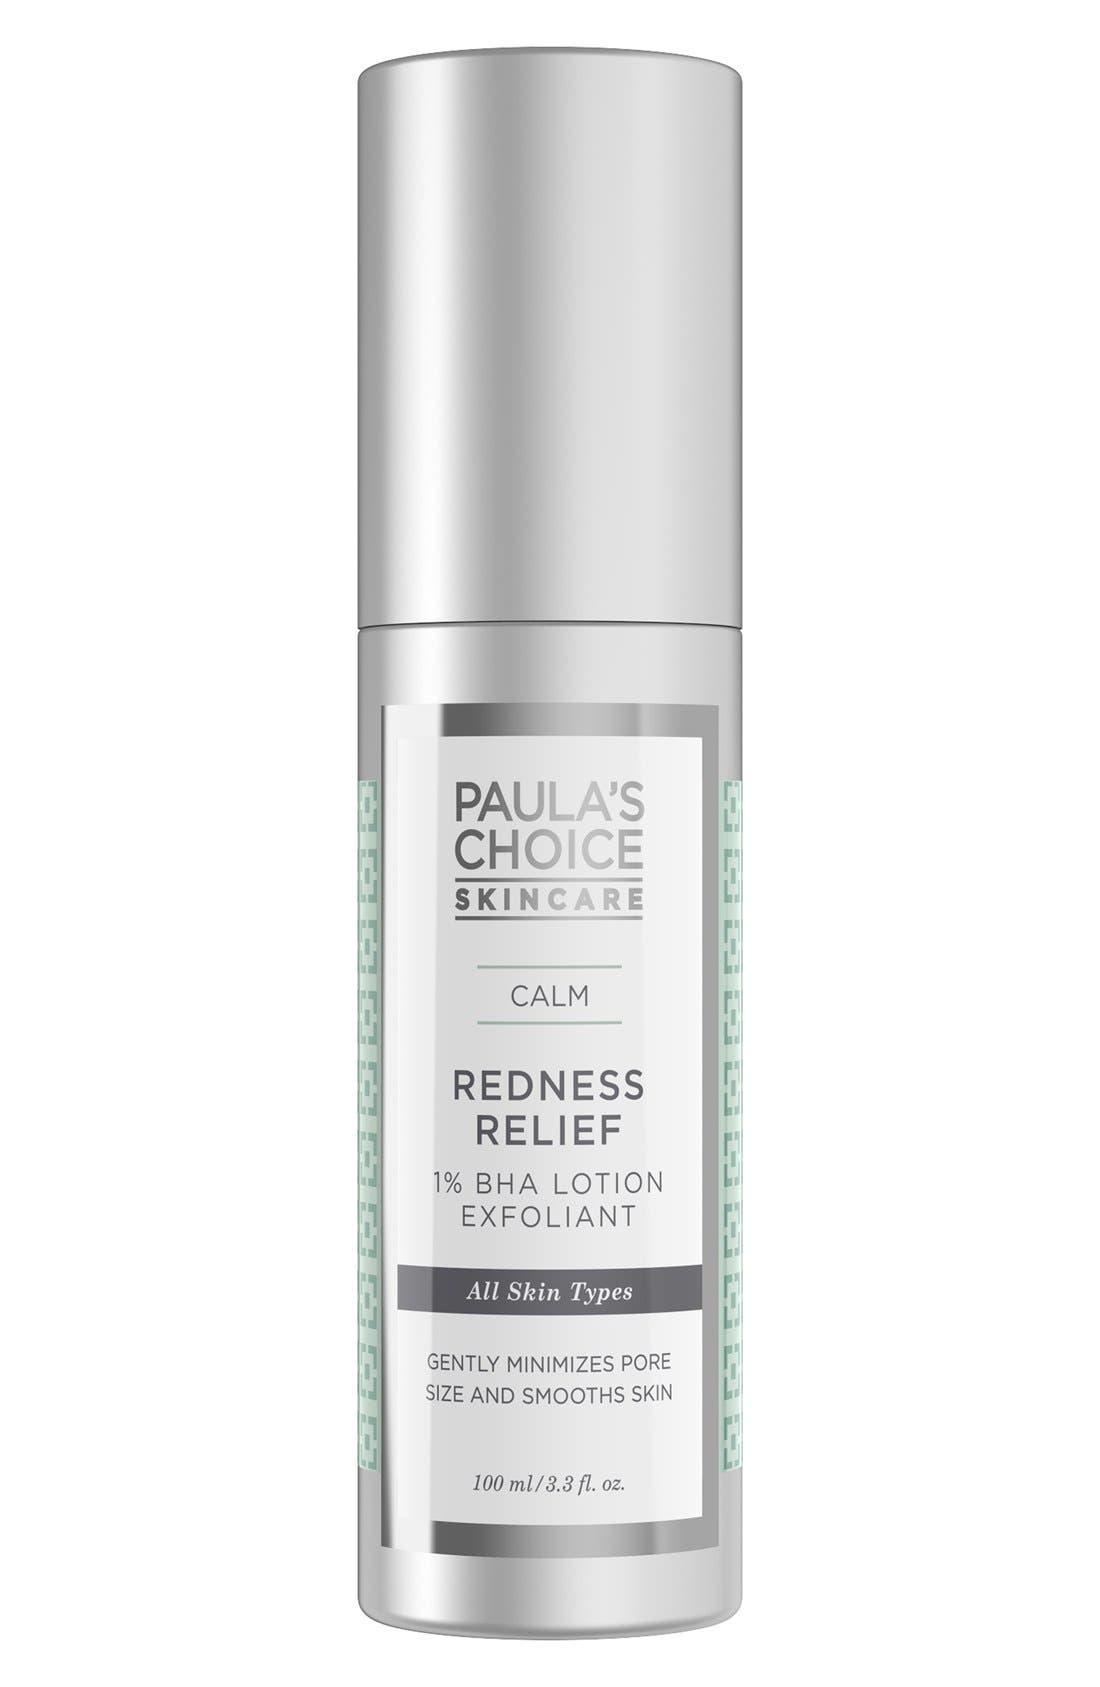 Calm Redness Relief 1% BHA Lotion Exfoliant,                             Main thumbnail 1, color,                             NO COLOR